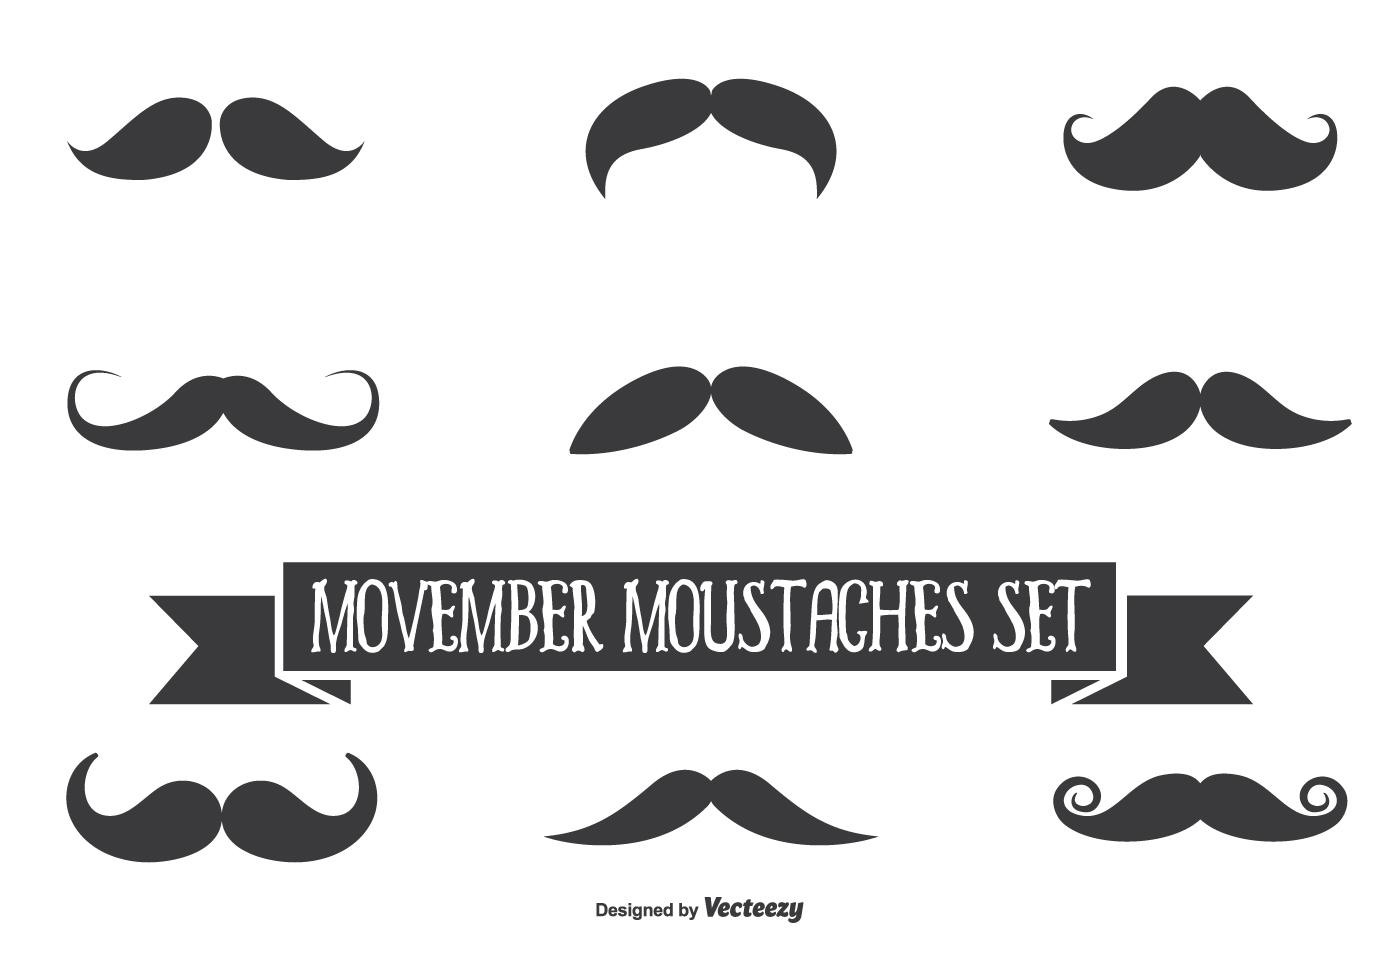 Movember Vector Moustache Set Download Free Vector Art